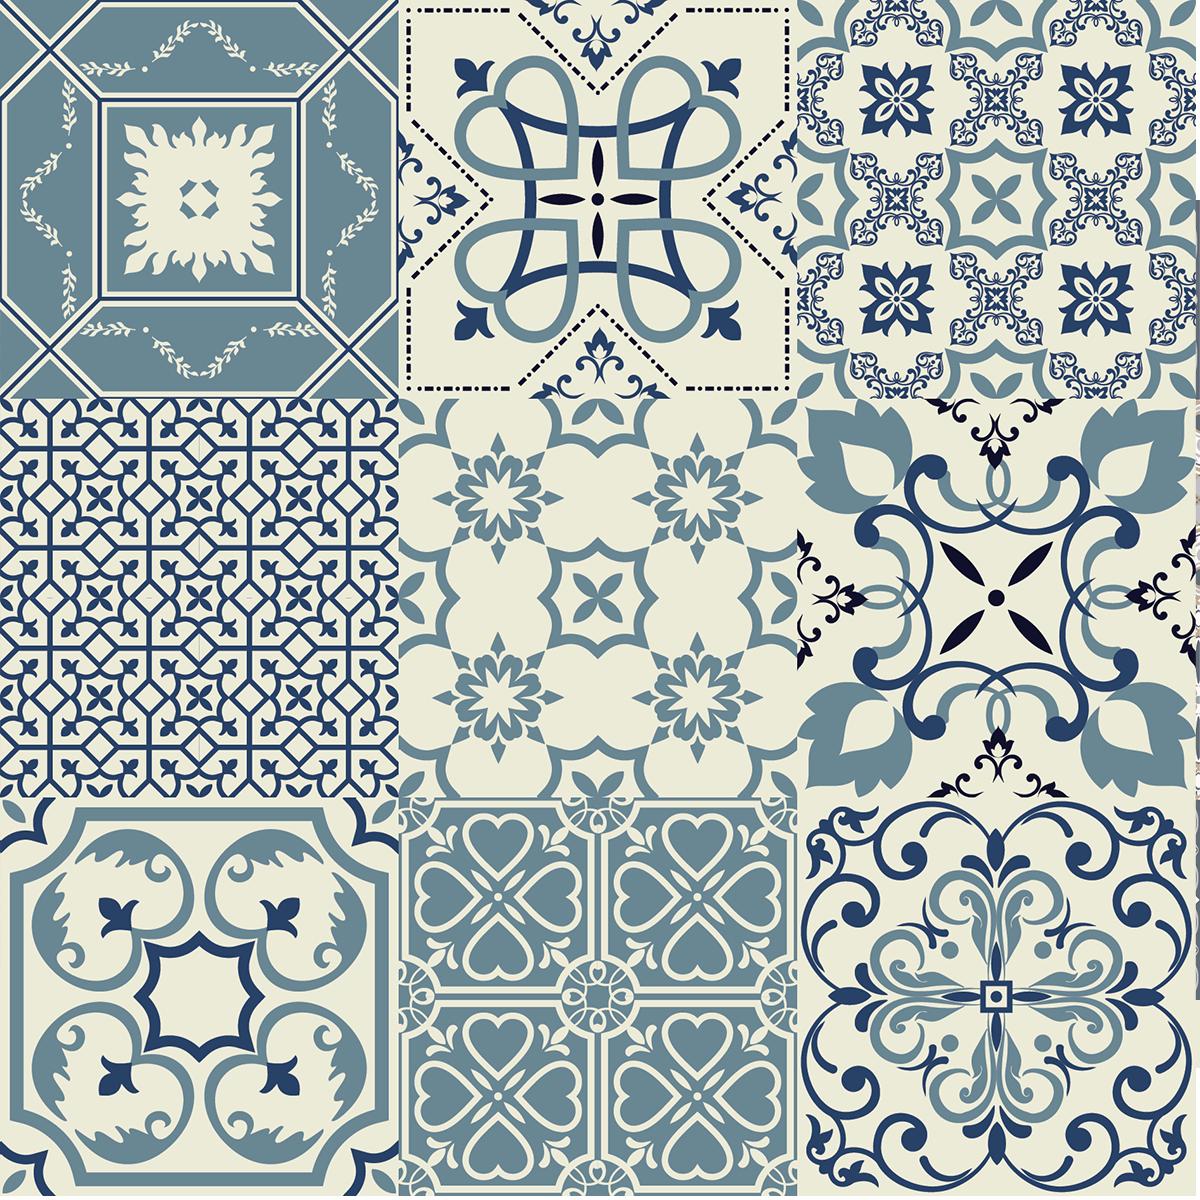 9 stickers carreaux de ciment azulejos teo cuisine carrelages ambiance sticker. Black Bedroom Furniture Sets. Home Design Ideas